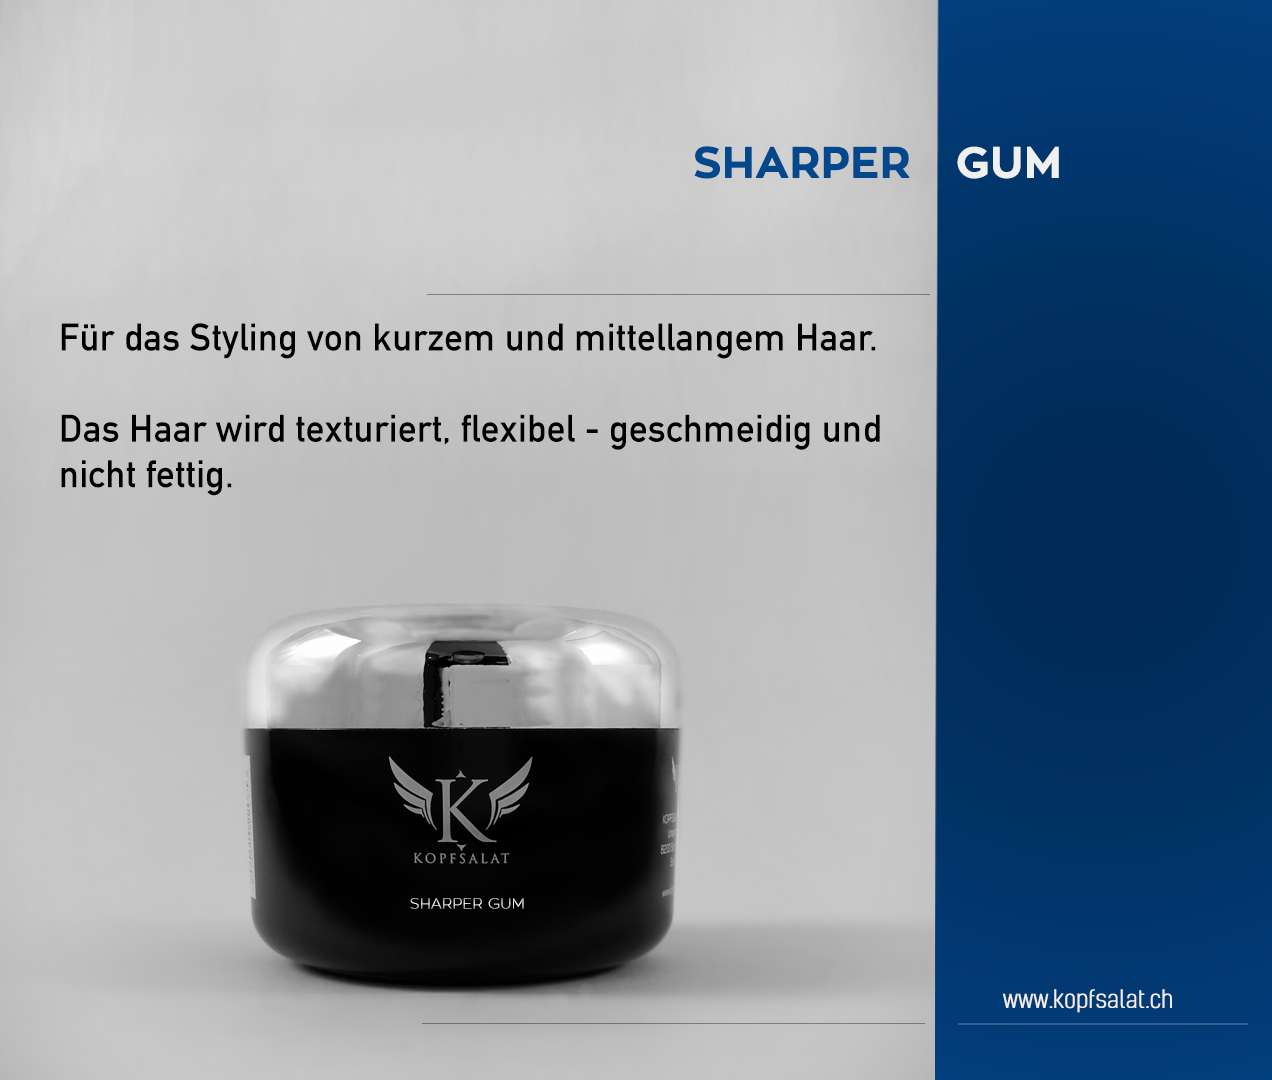 5 sharper gum